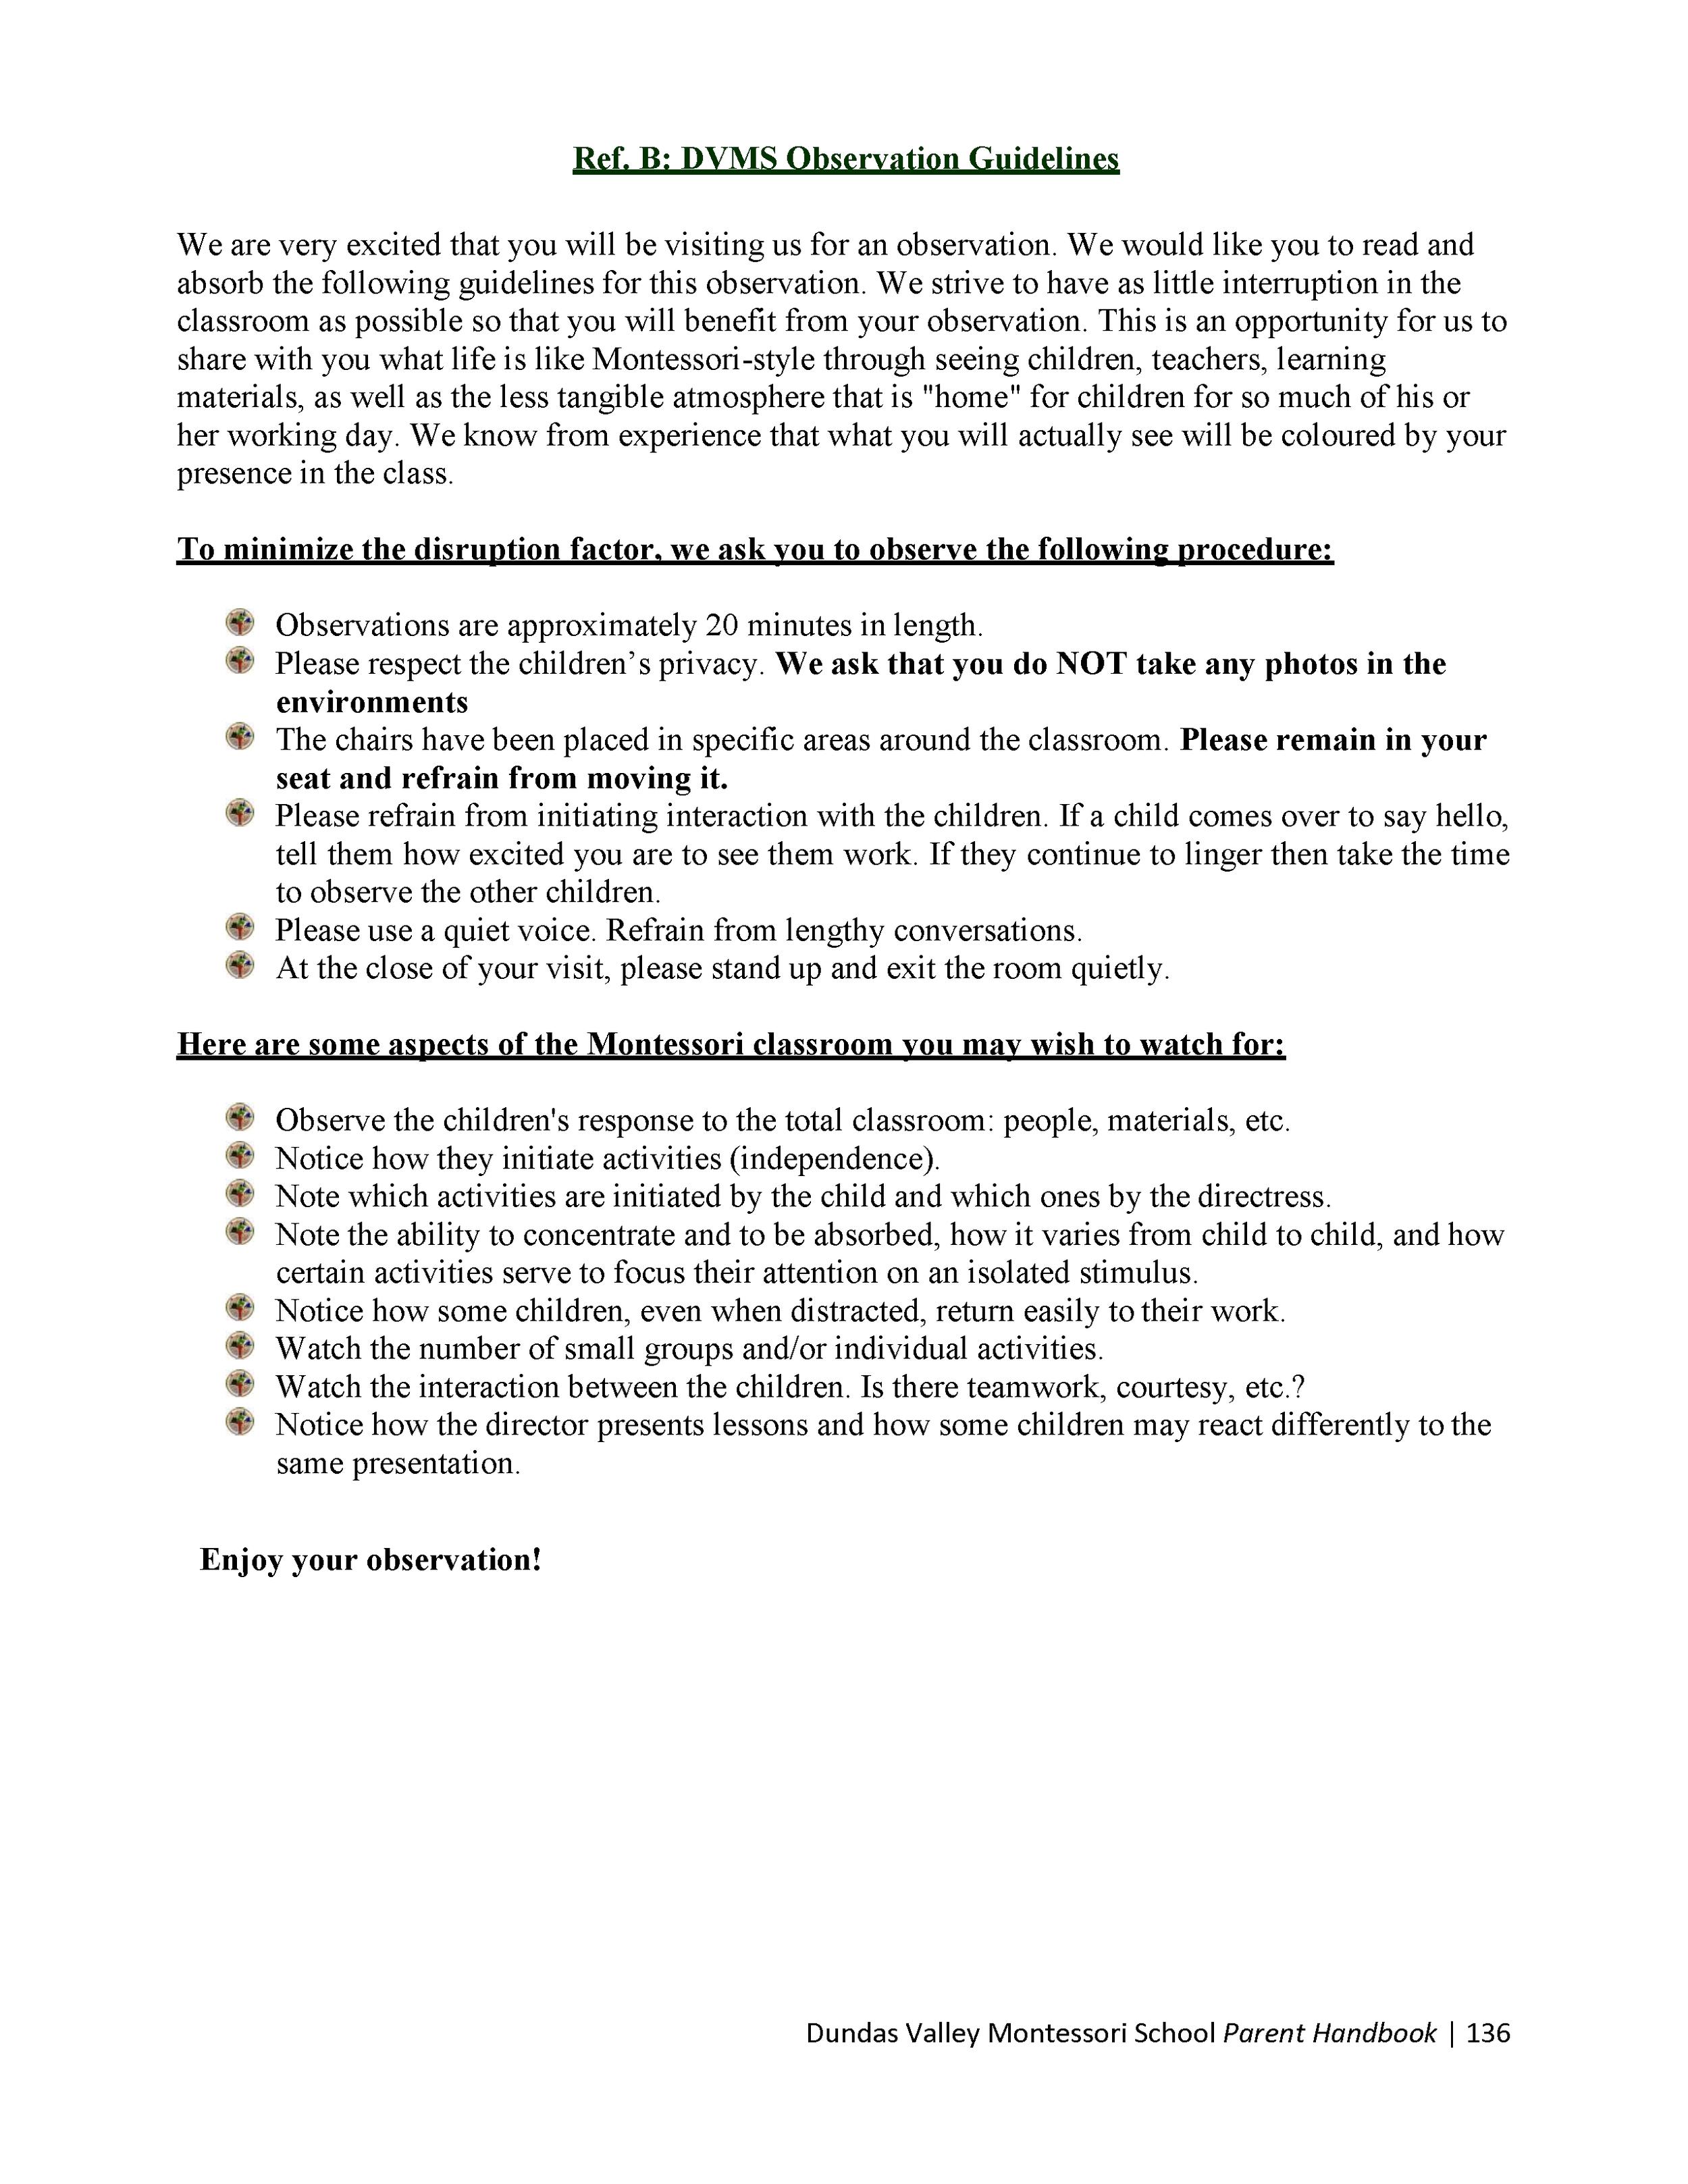 DVMS-Parent-Handbook-19-20_Page_138.png